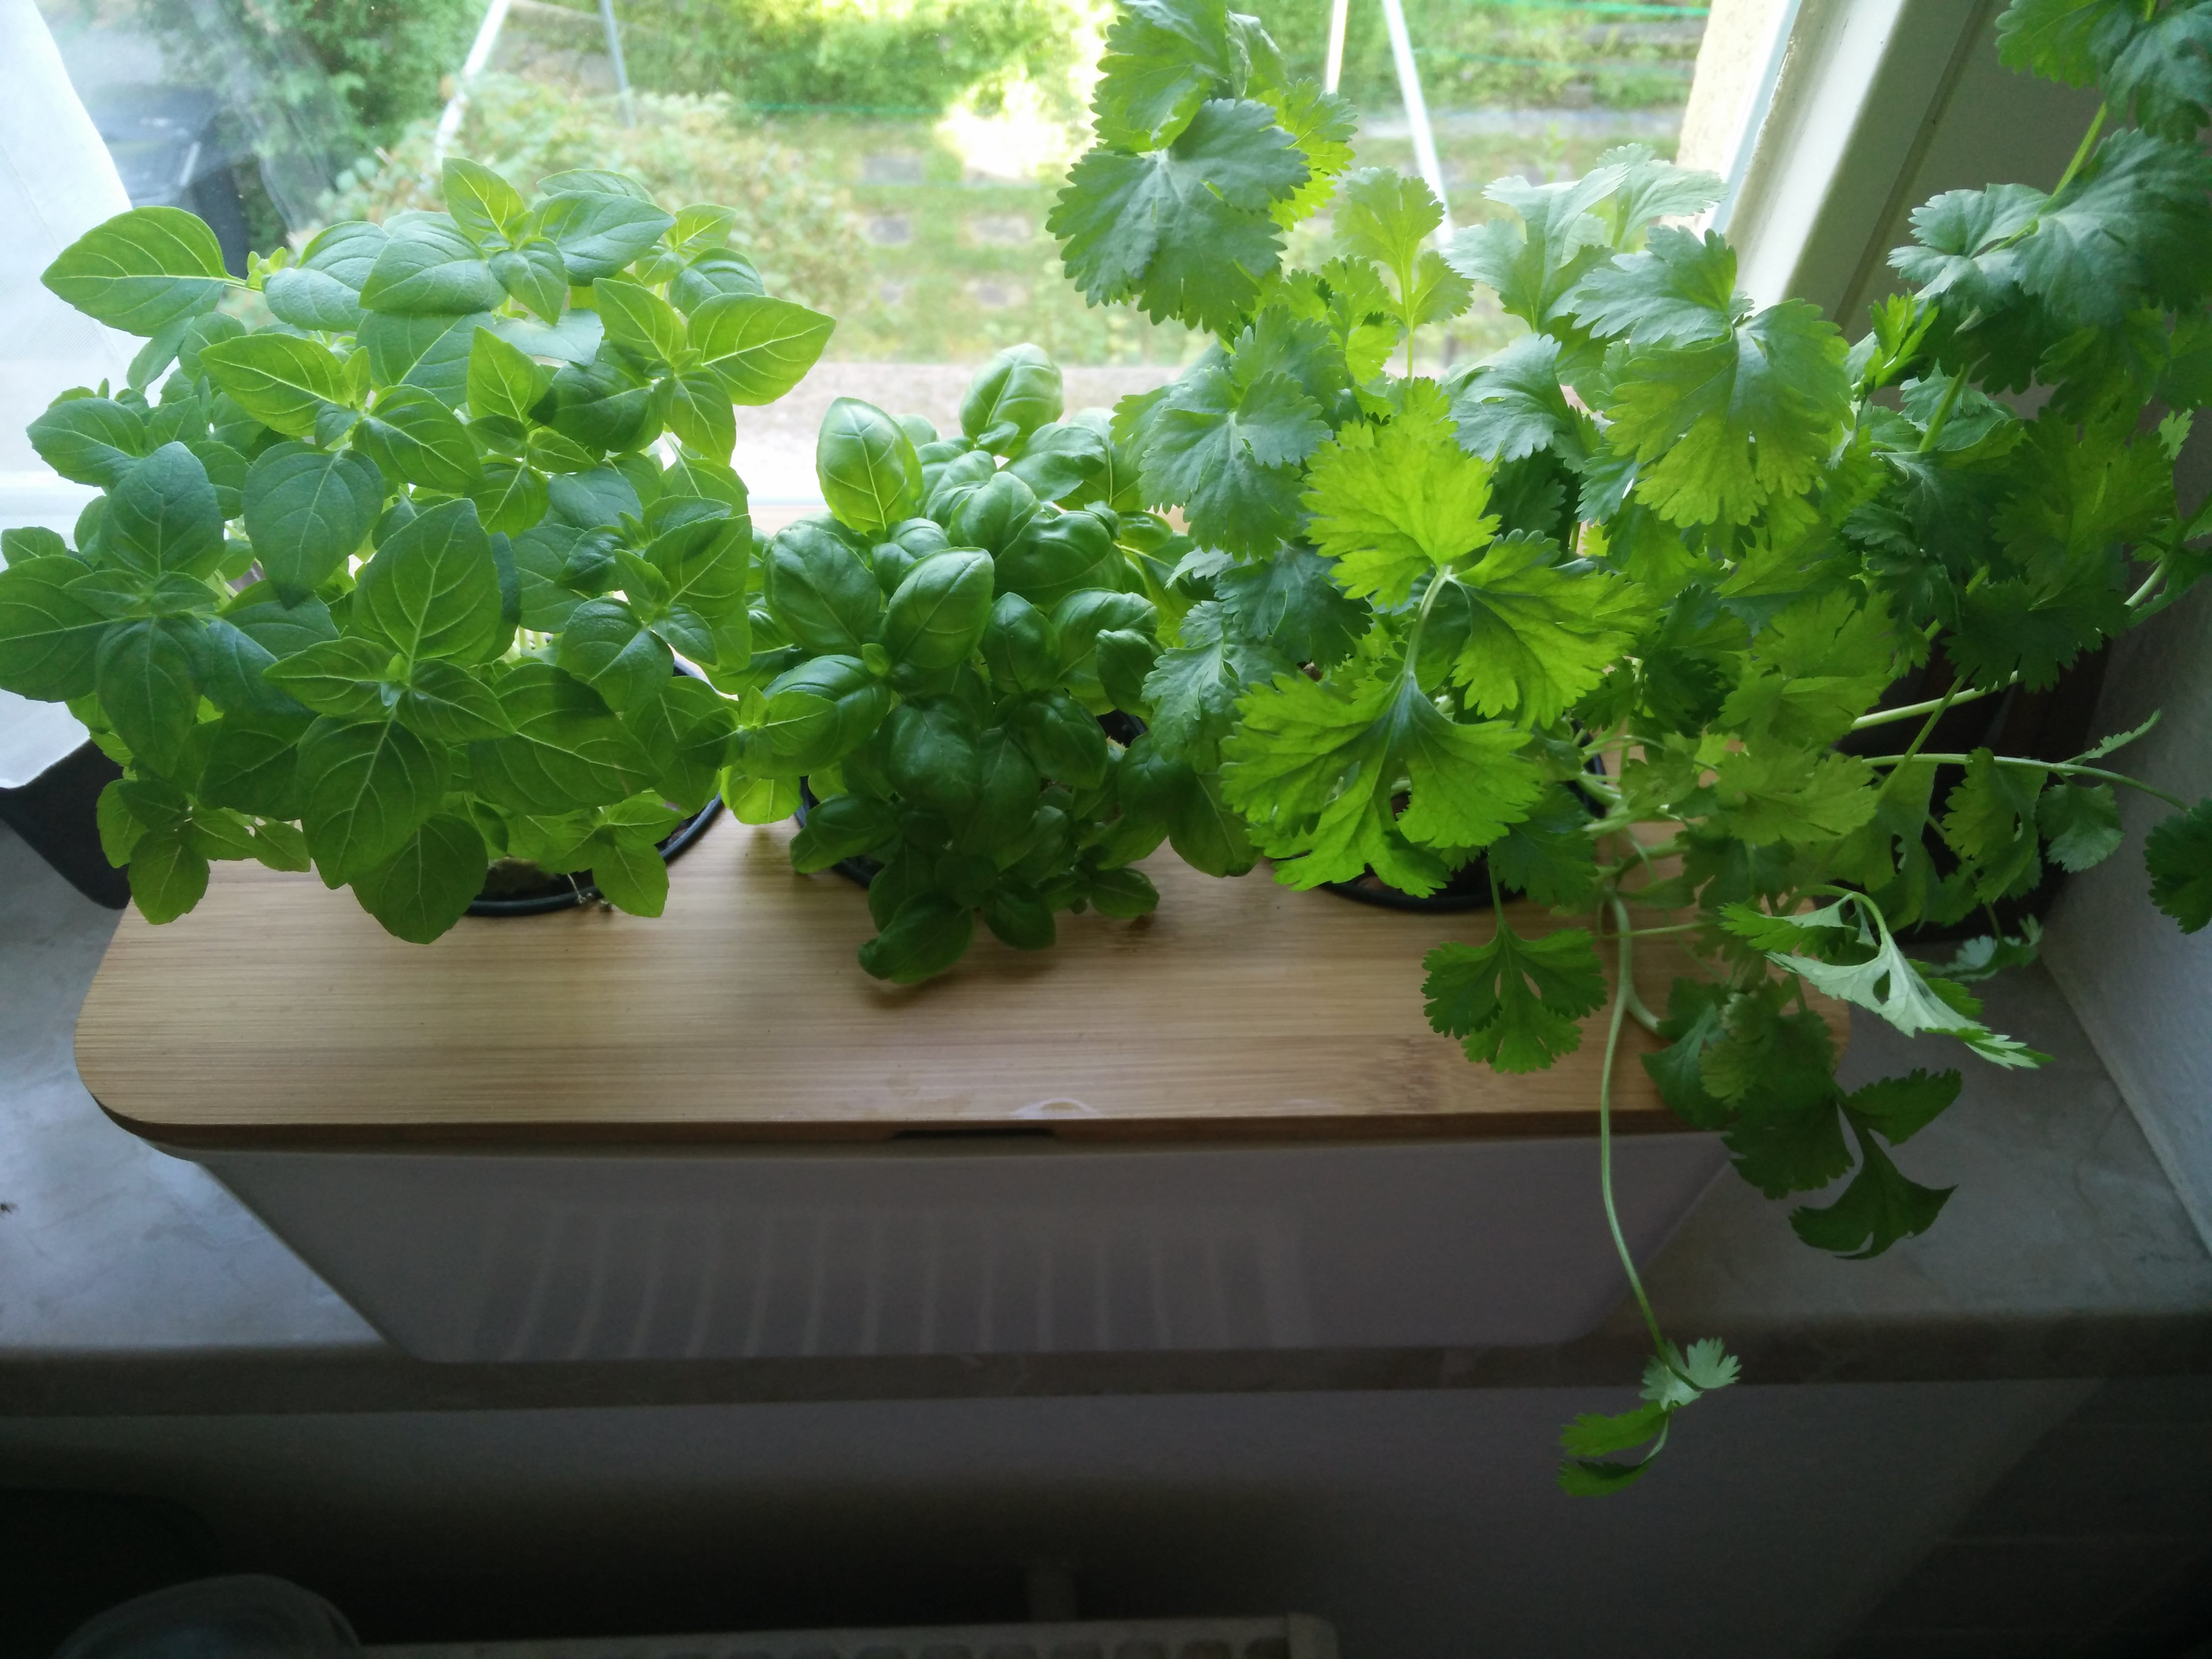 Hydroponics Herb Garden Kitchen Windowsill Hydroponic Herb Garden 5 Steps With Pictures